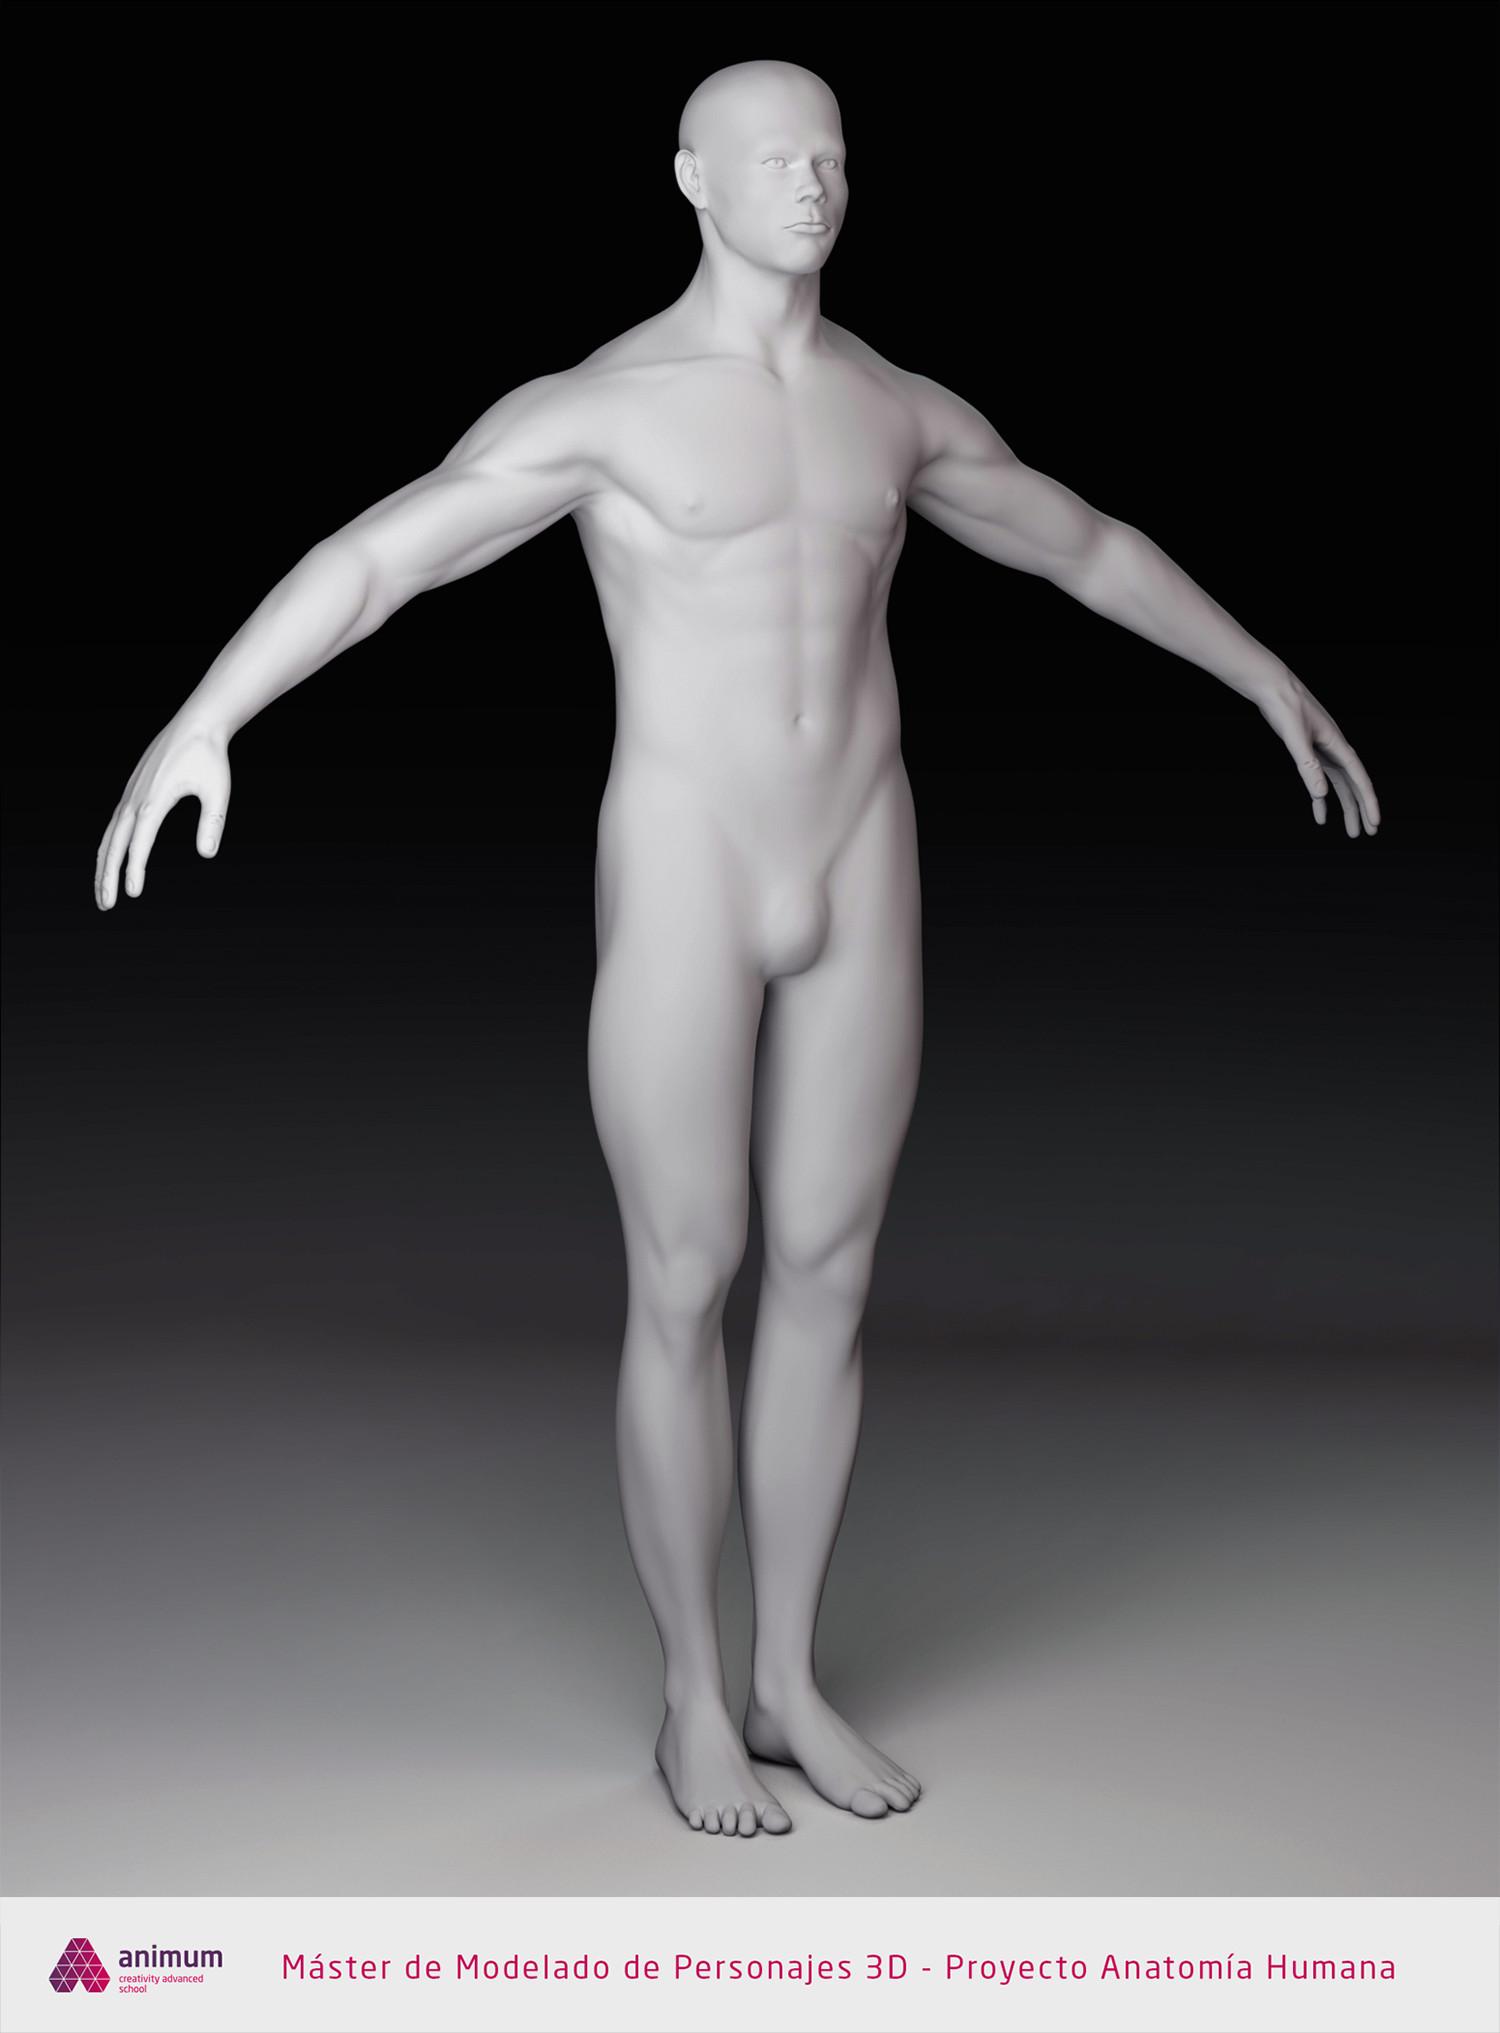 Eusebio hb humano cuerpo shaded1